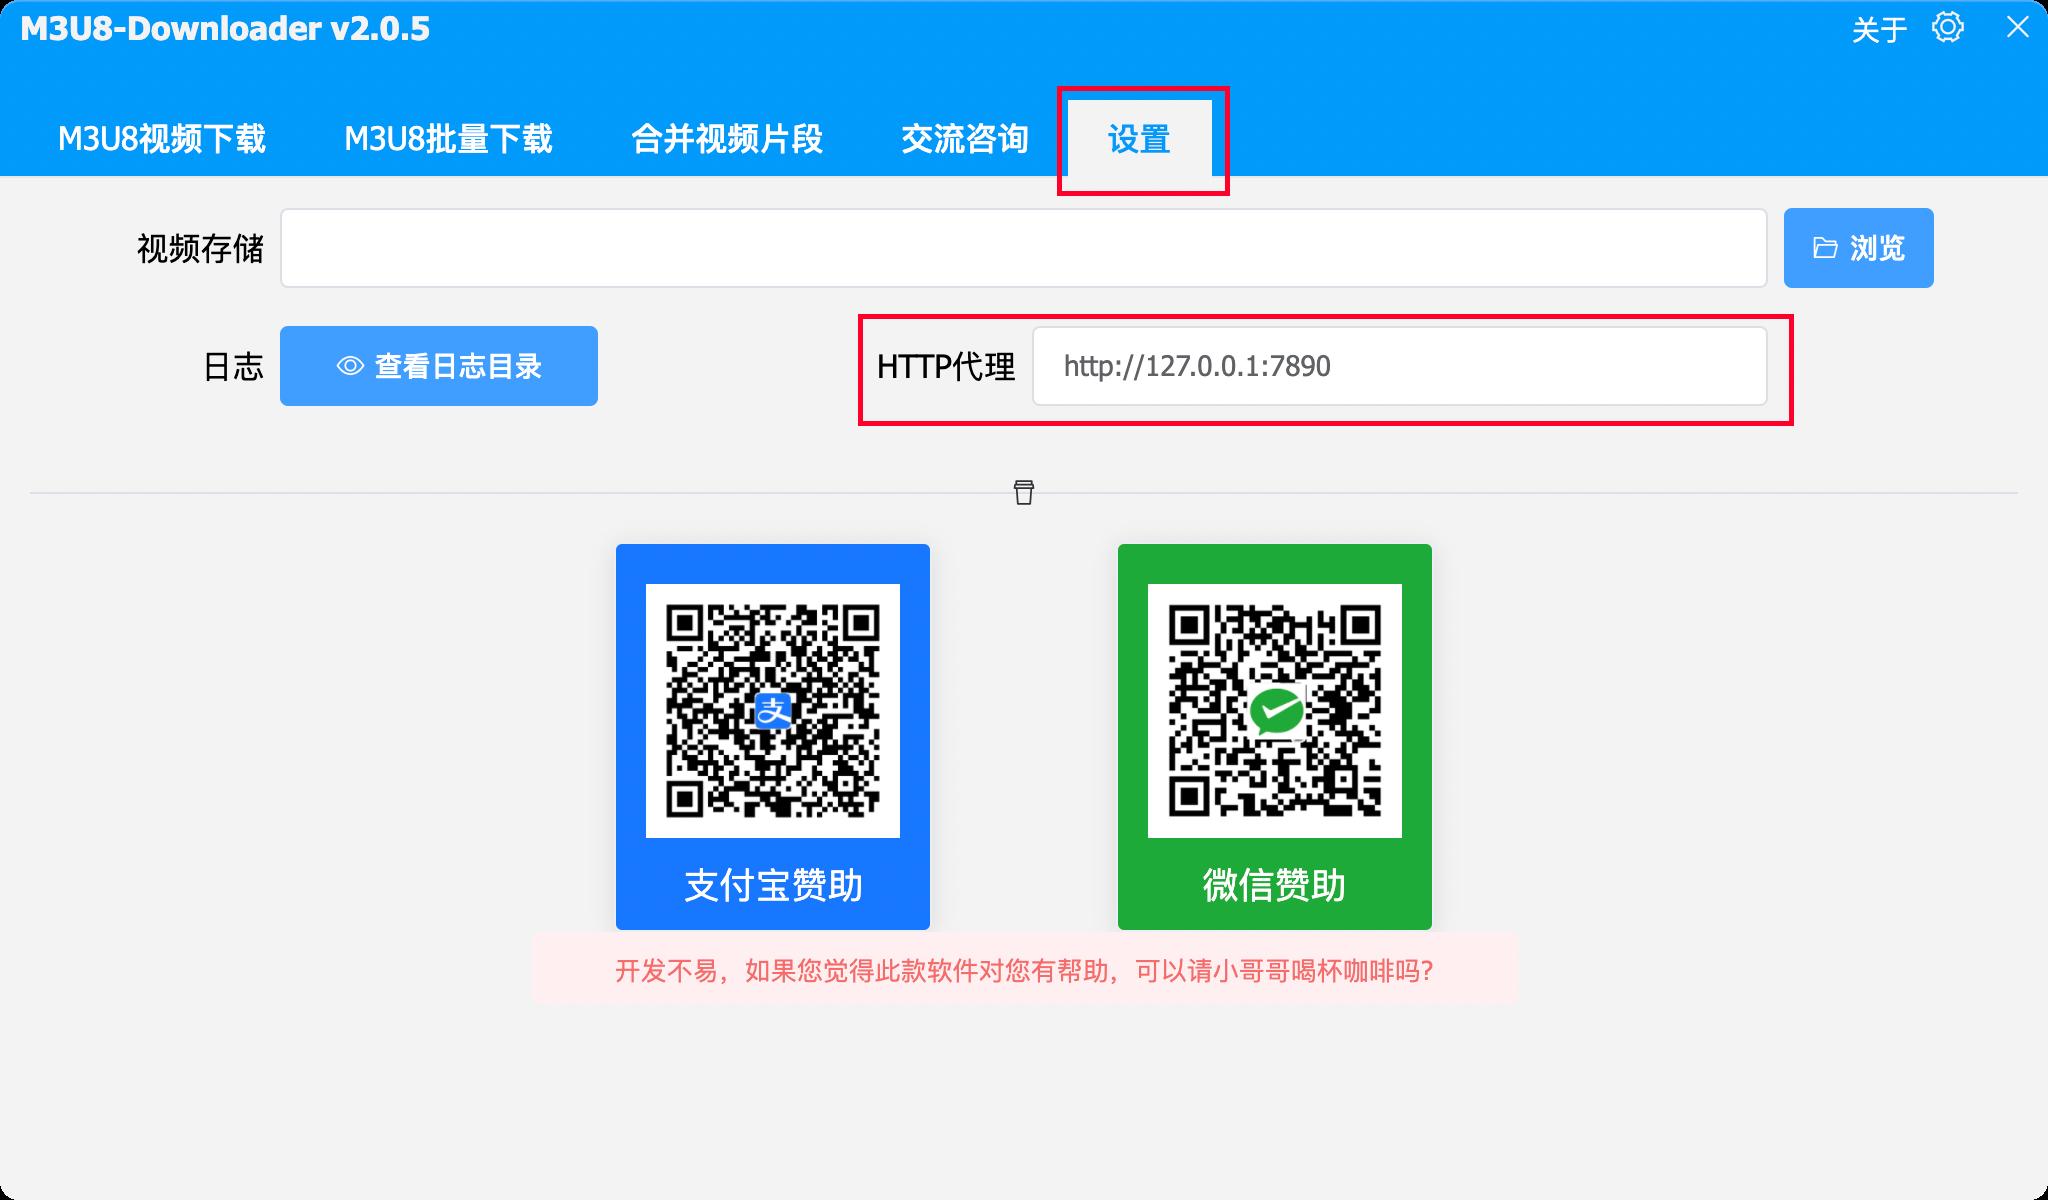 HTTP代理设置-M3U8下载.png